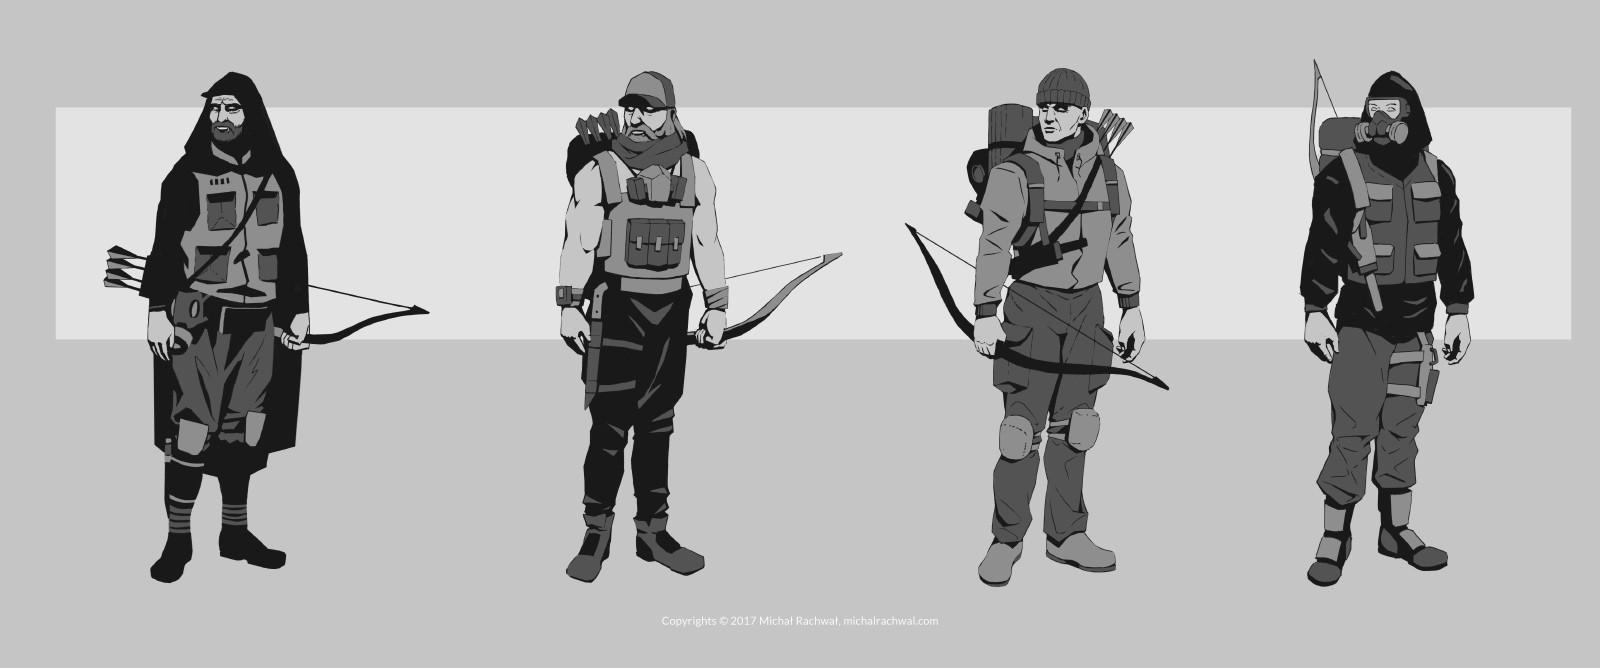 Michal rachwal michal rachwal hunter sketches3